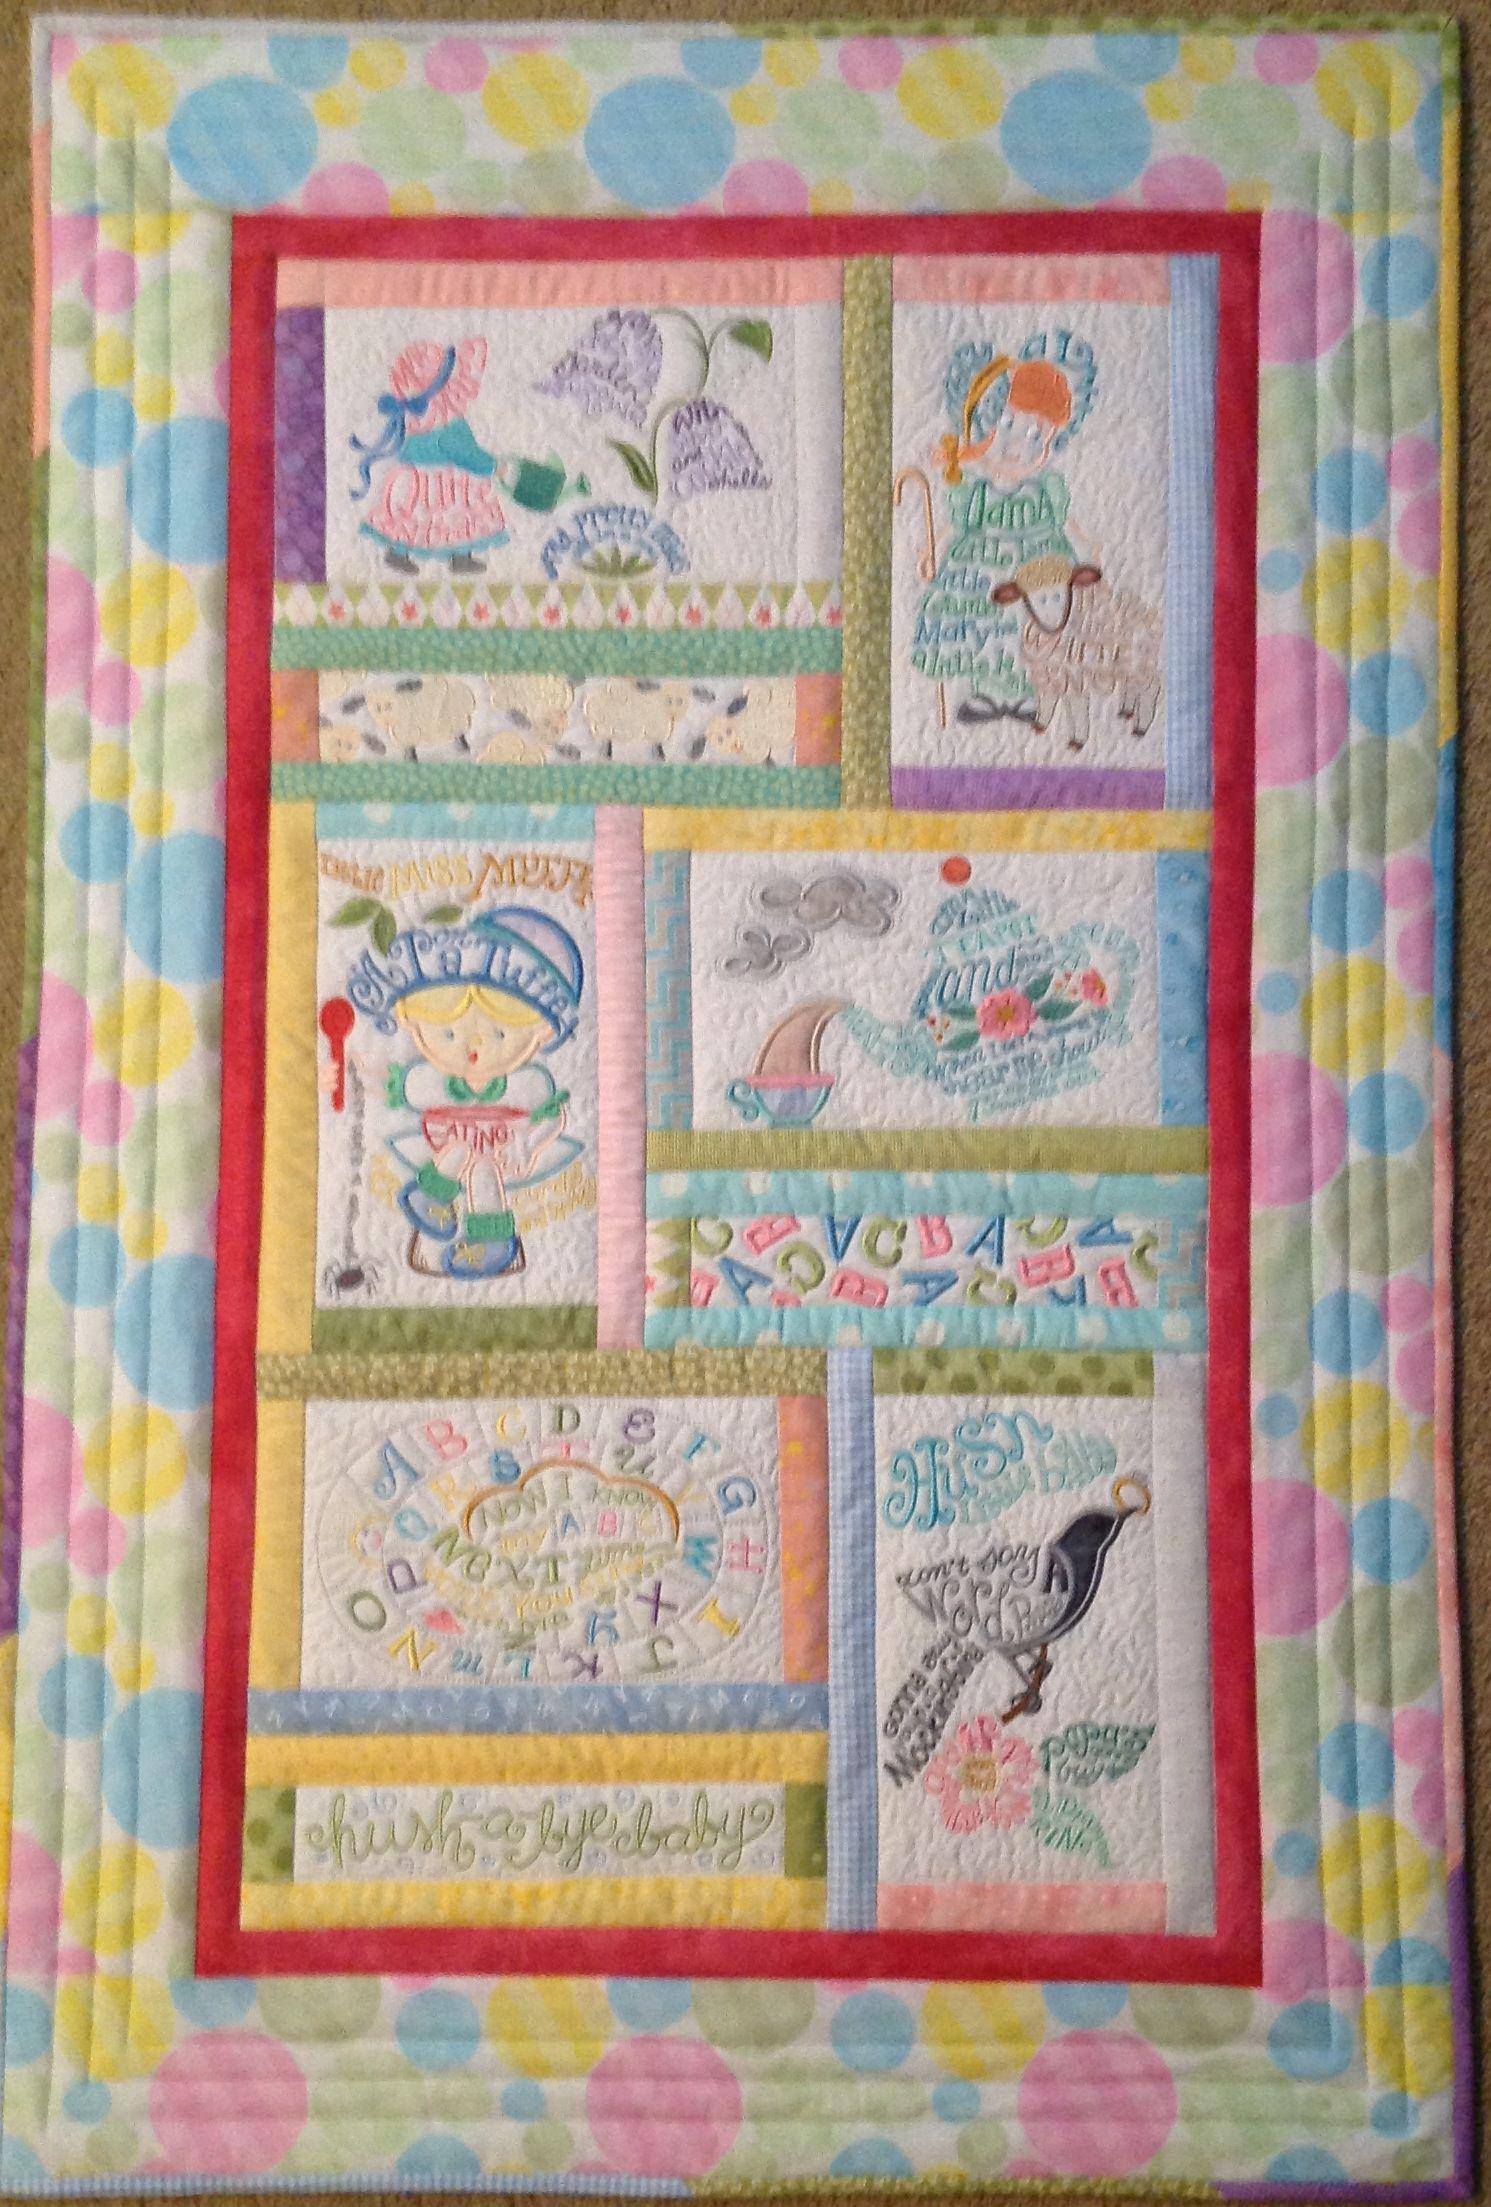 Two Blocks From Anita Goodesigns Nursery Rhymes They Make A Cute